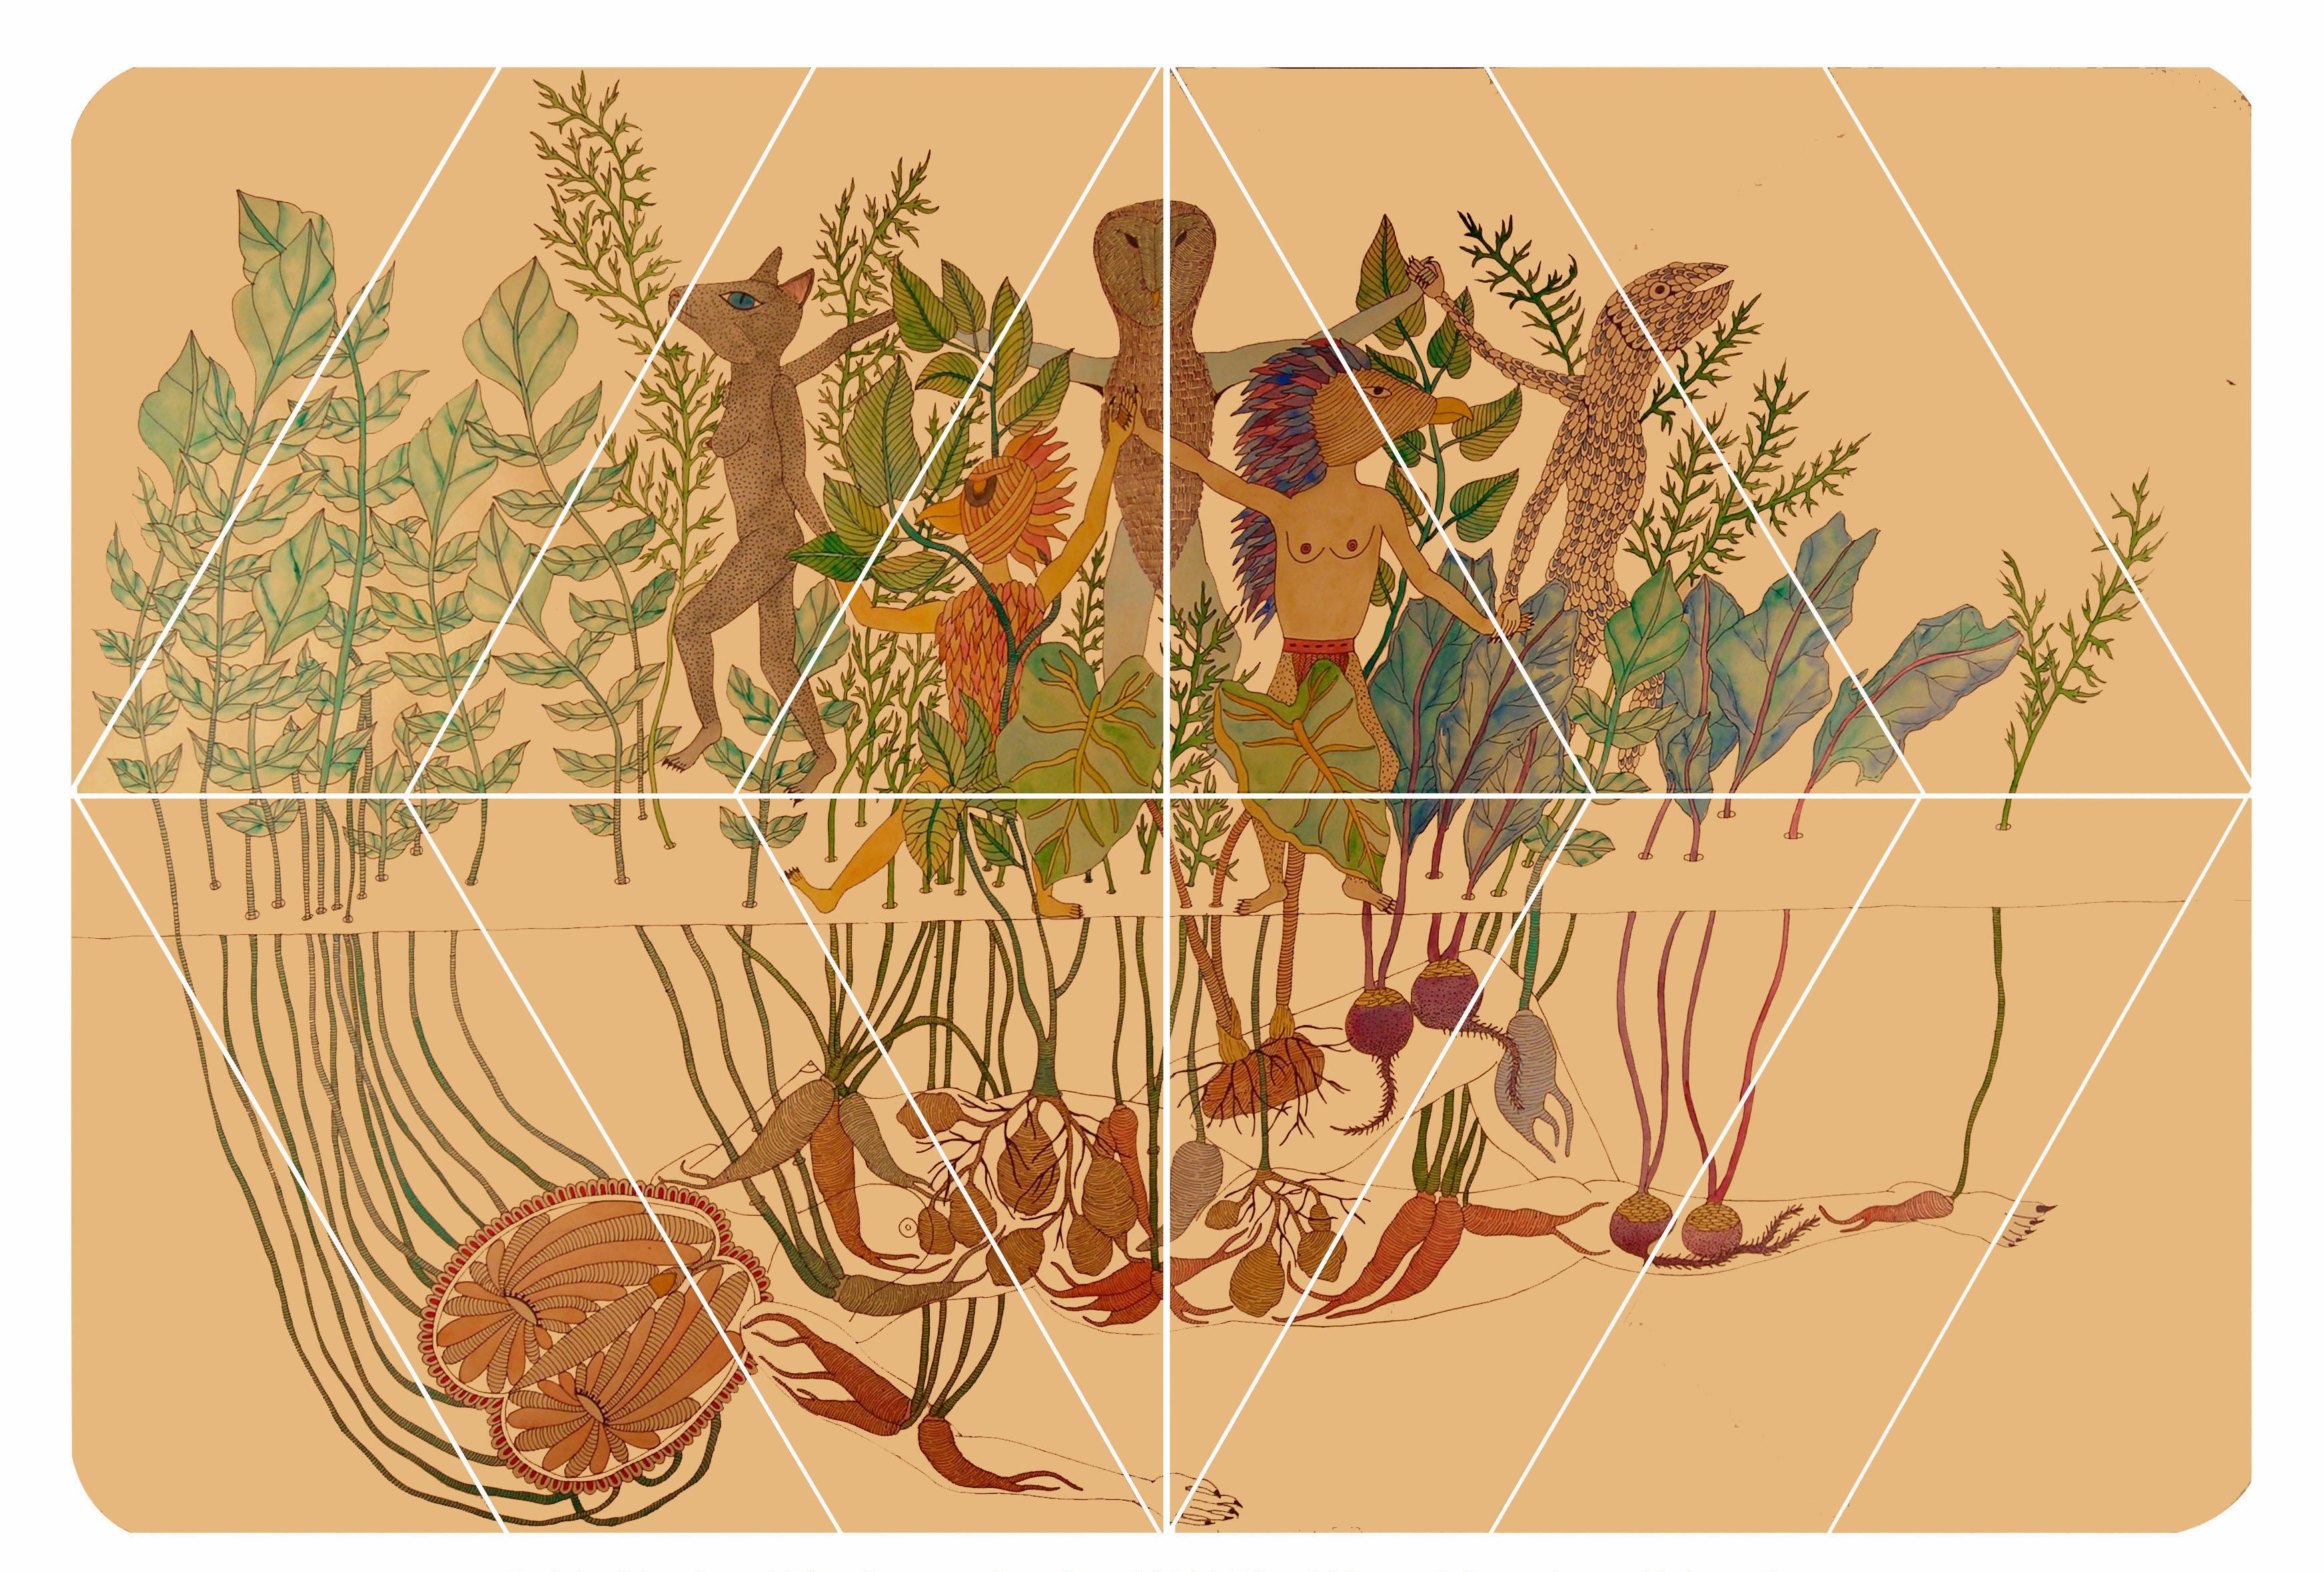 15050412573210. Rithika Merchant, The Creative Sacrifice, Gouache & Ink on Paper, 27.6 x 39.3 in, 2011